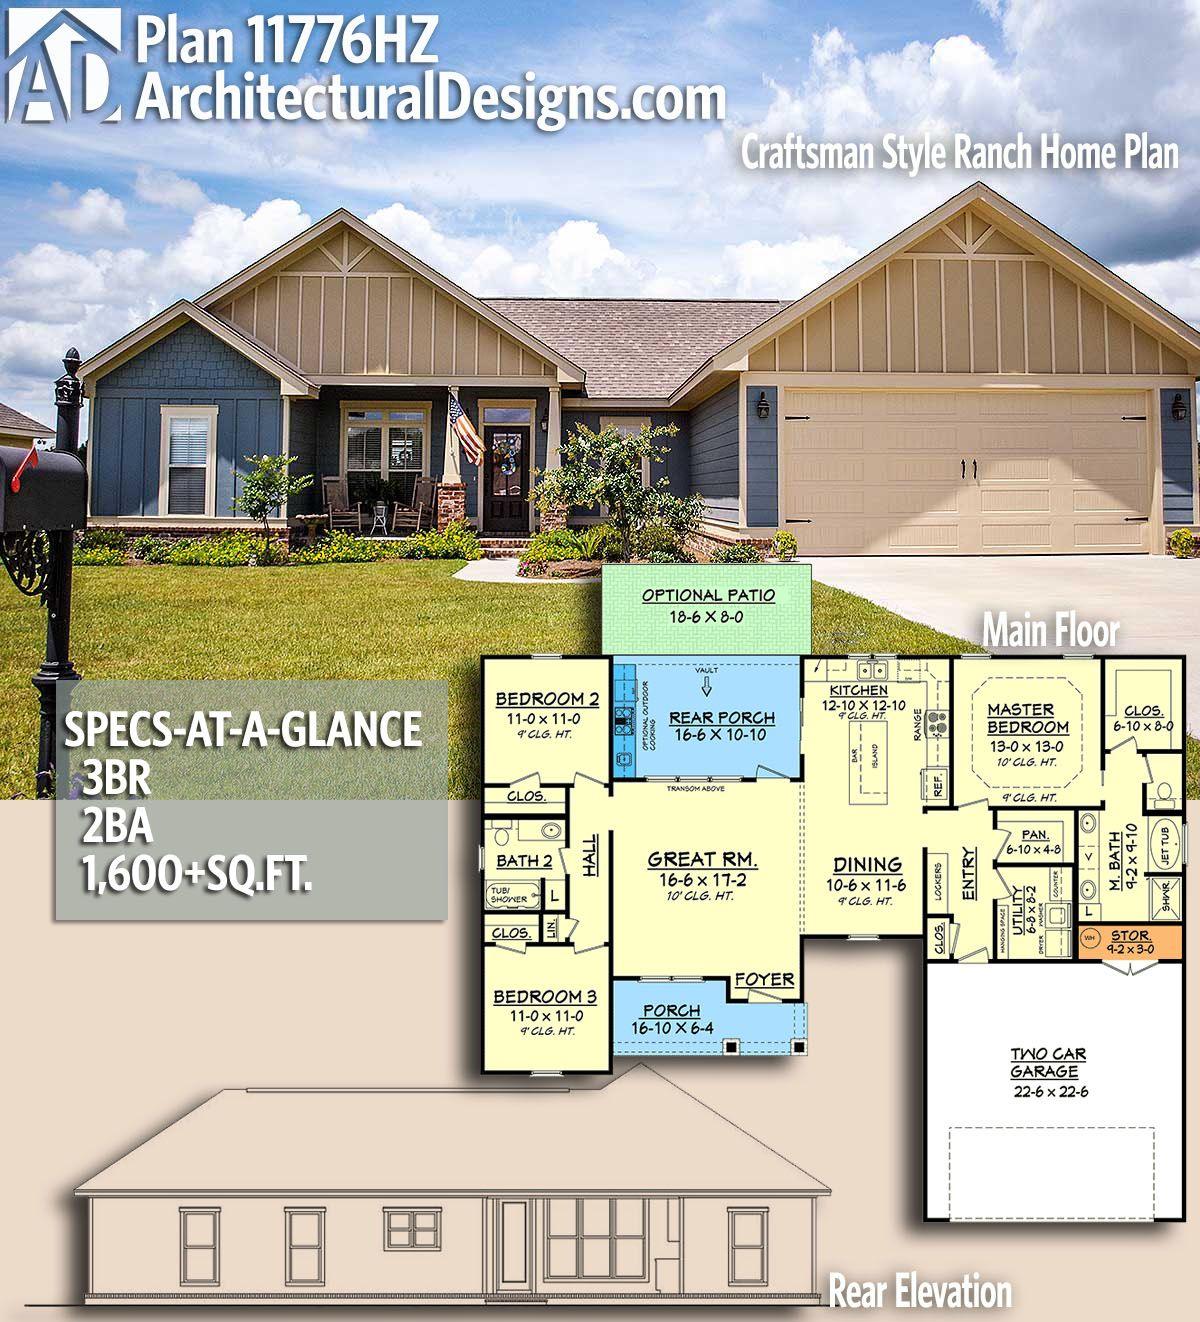 Plan 11776hz Craftsman Style Ranch Home Plan Ranch House Plans Craftsman House Plan House Plans